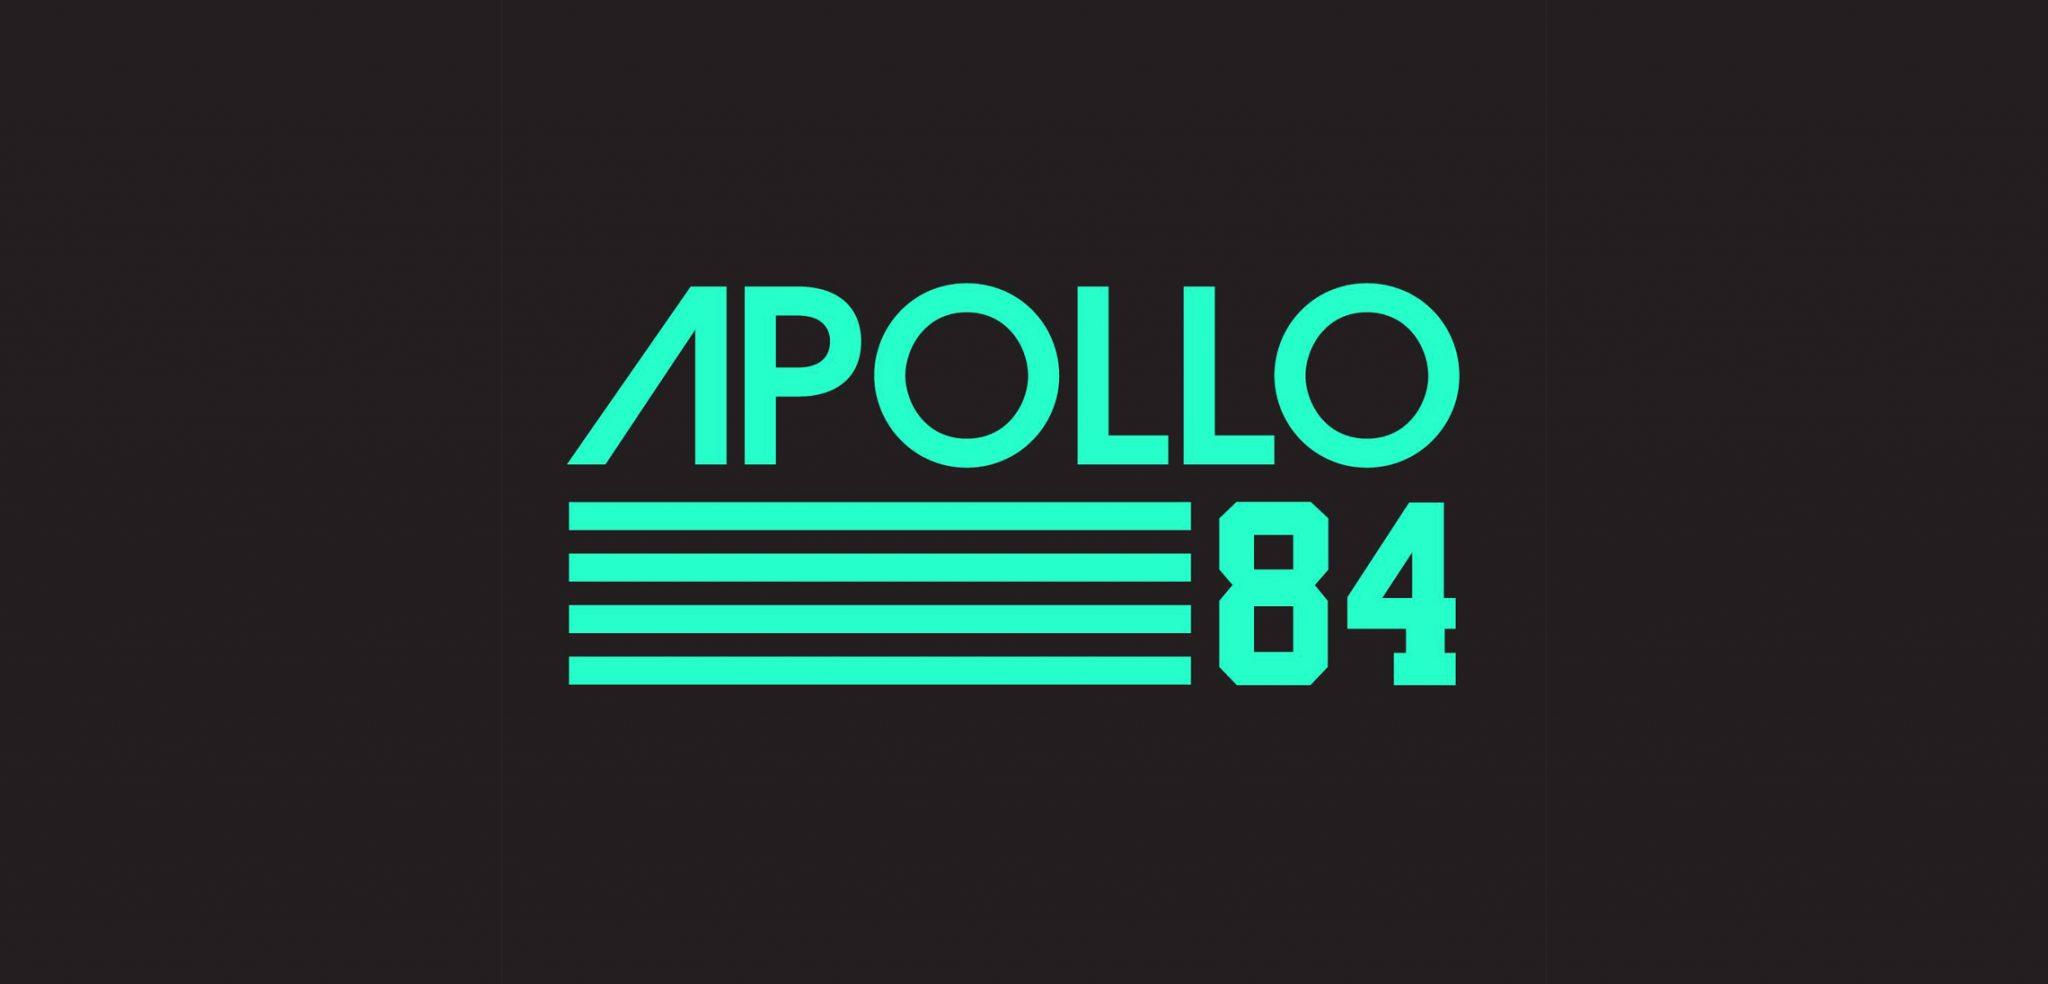 Apollo 84 - Human Machines hero